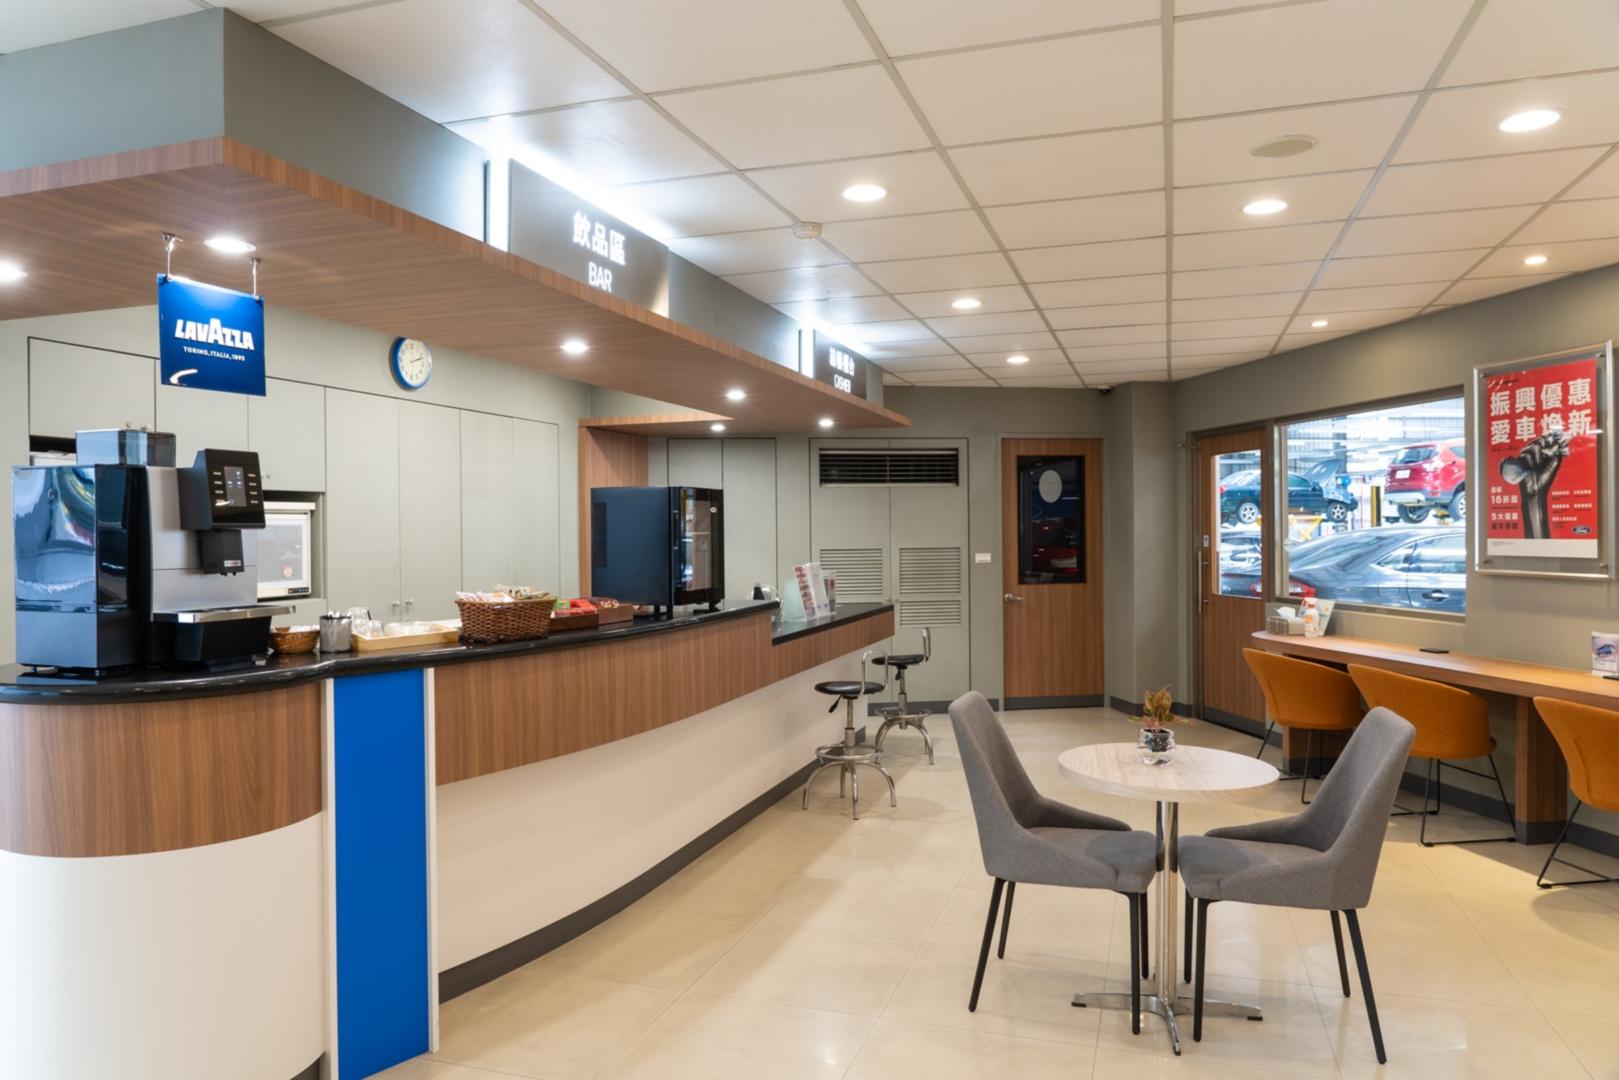 SMALL_【圖五】Ford福彰汽車員林據點嶄新落成的客休區融合木質元素,並由Ford與百年經典咖啡品牌Lavazza合作,以優質咖啡及絕佳體驗迎接準車主與新車車主